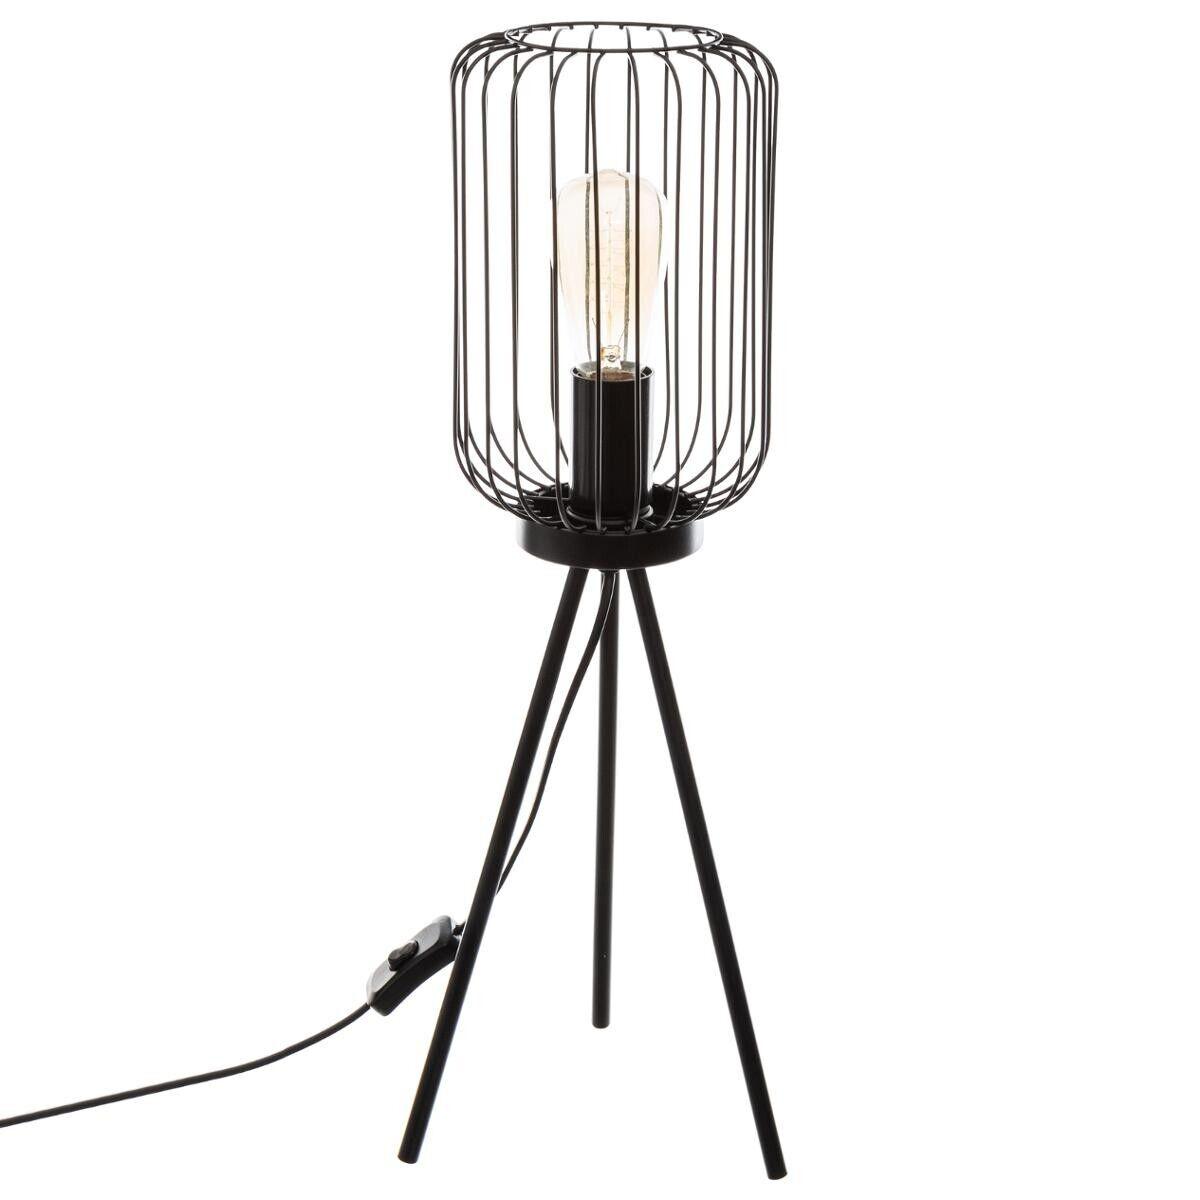 "Atmosphera Lampe à poser trépied ""Egio"" H59"